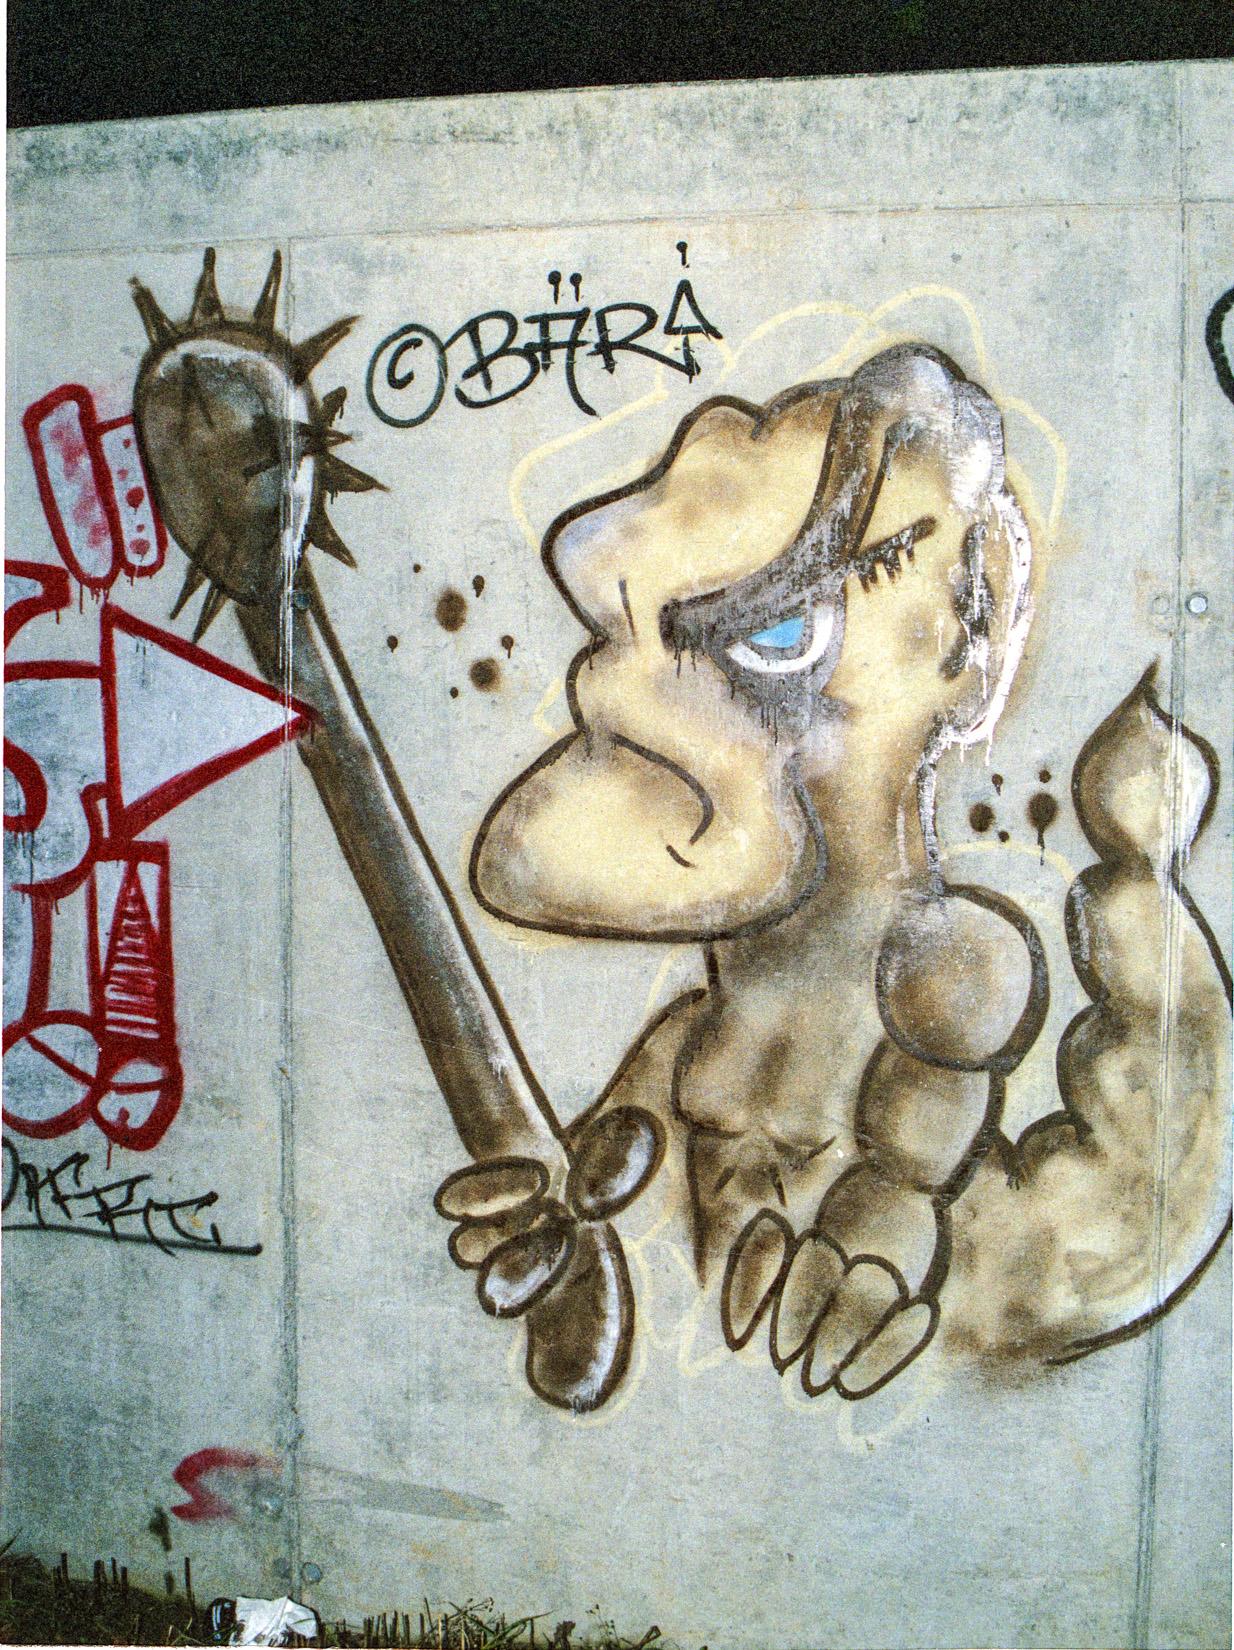 Frankfurt_Graffiti_1988_1989_H88_FRC (12 von 25)